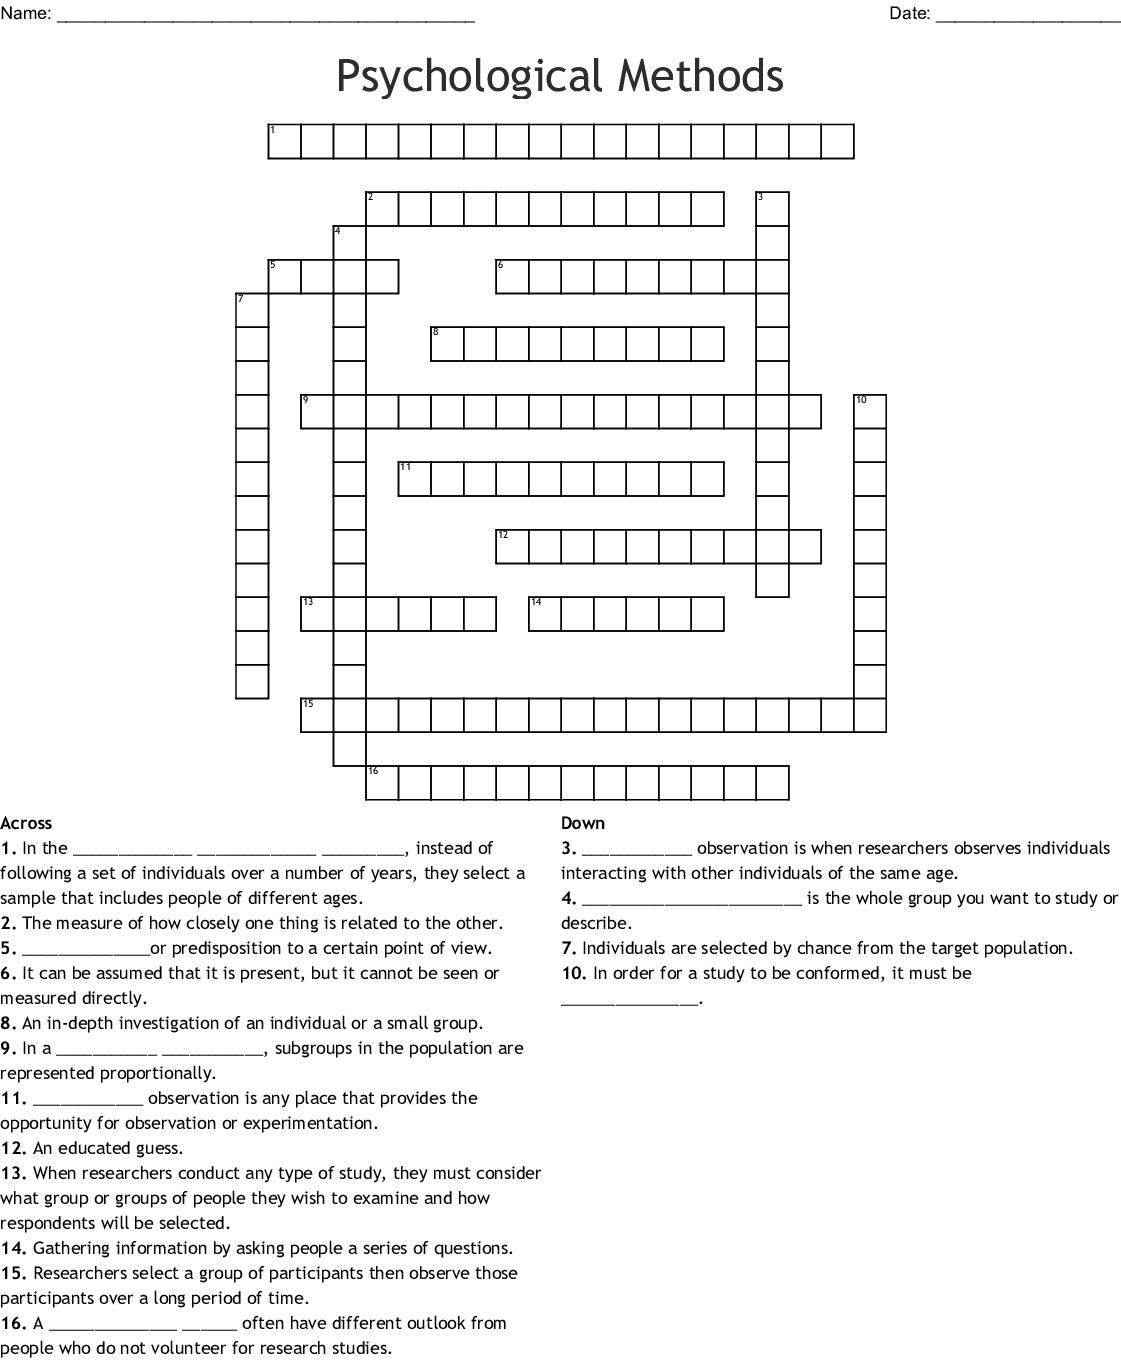 Psychological Methods Crossword